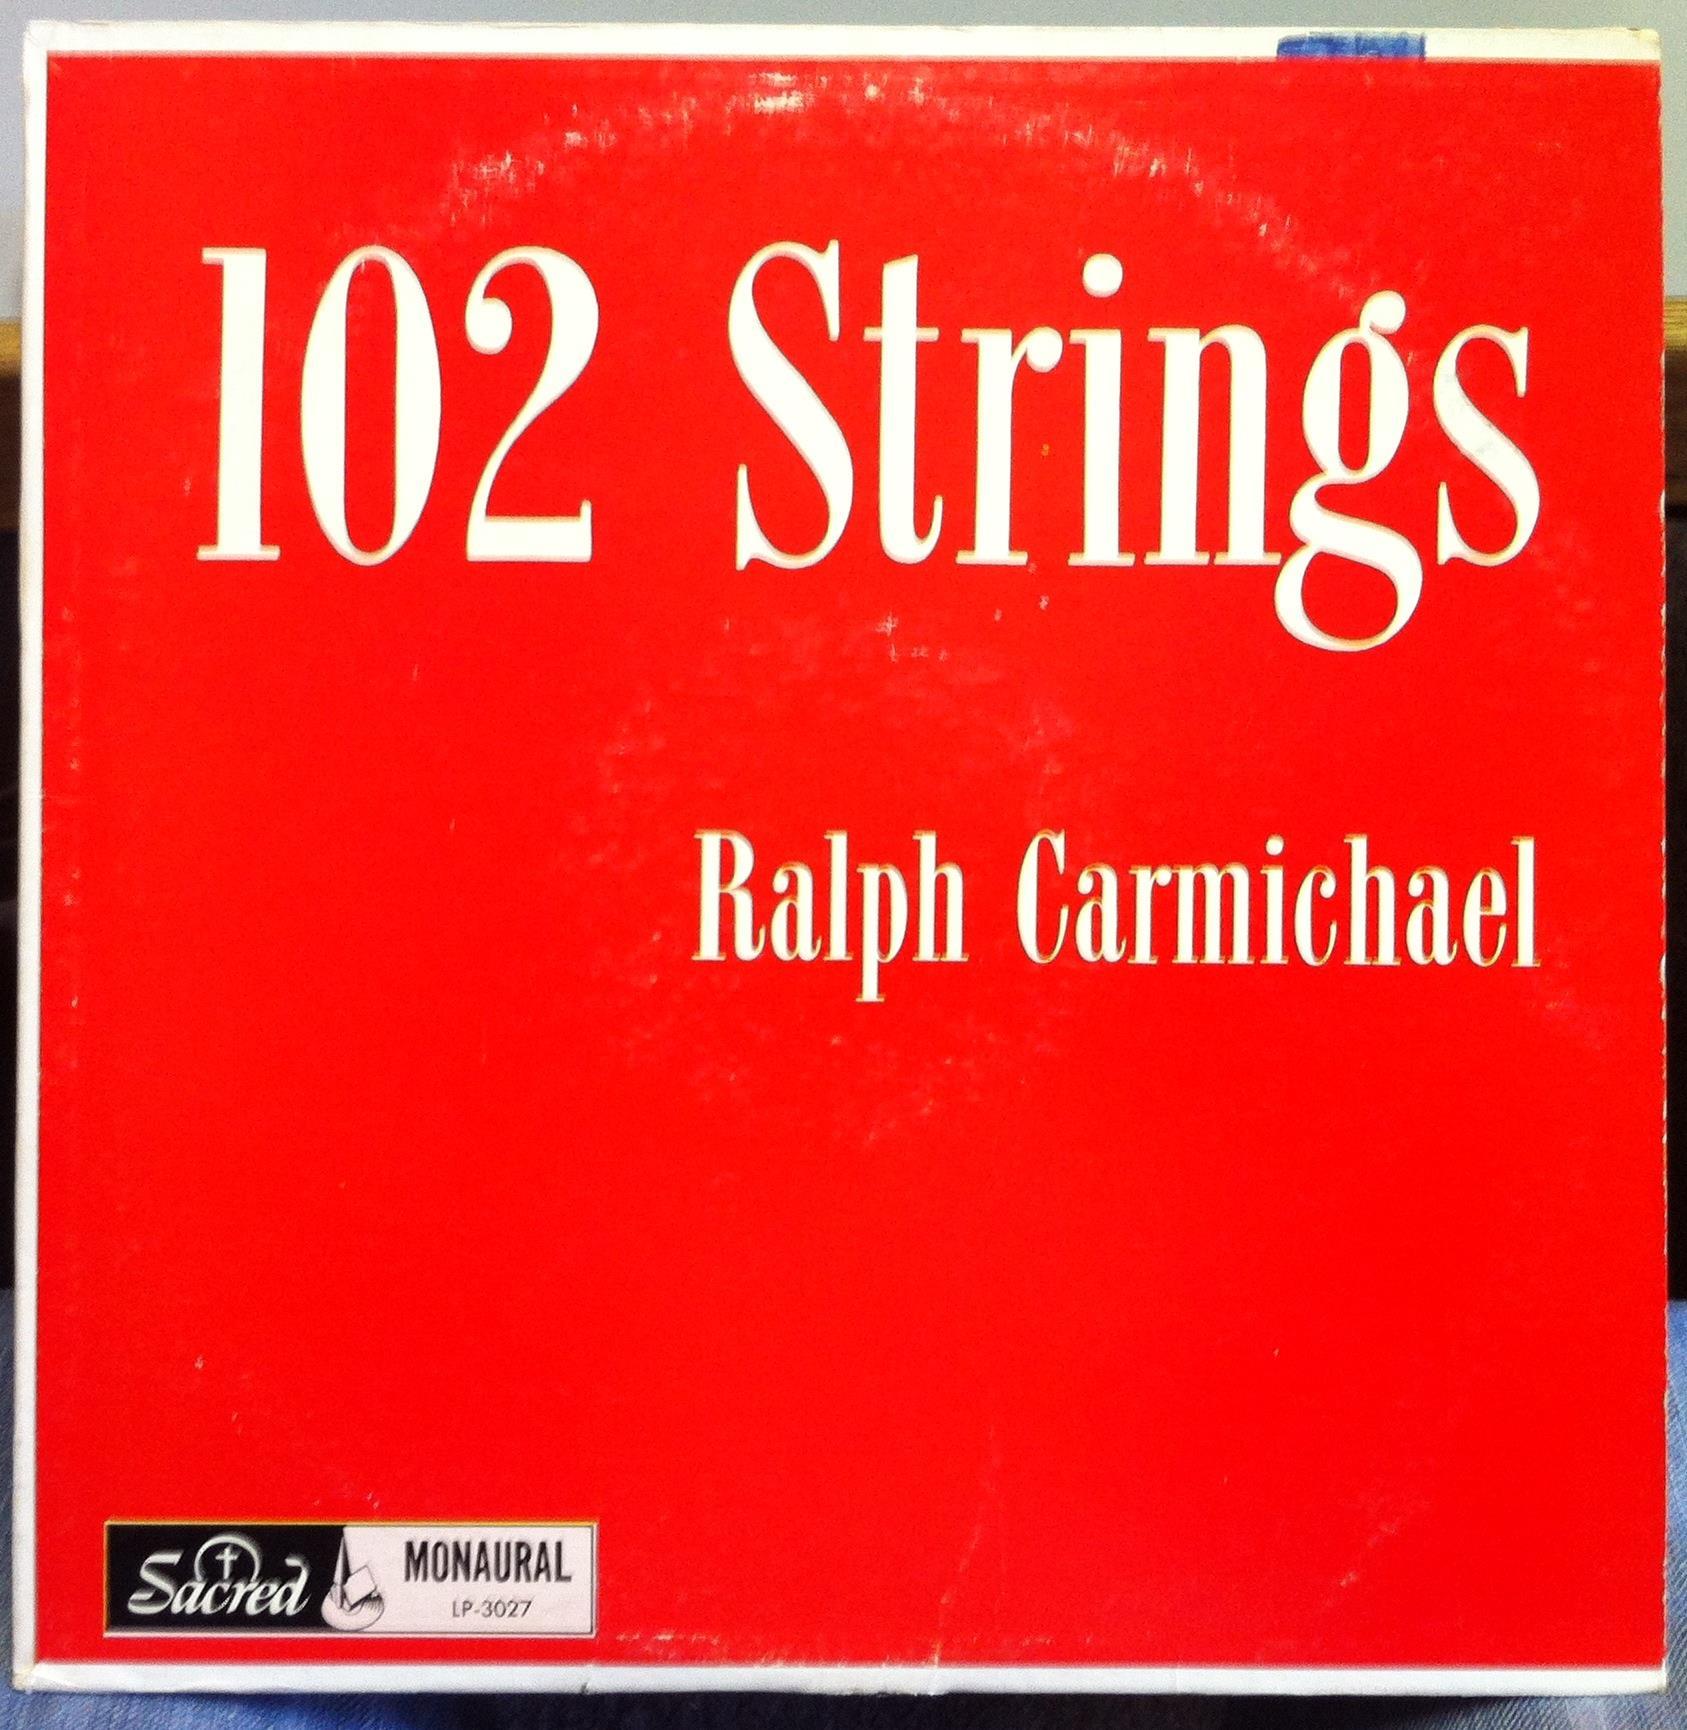 Ralph Carmichael - 102 Strings